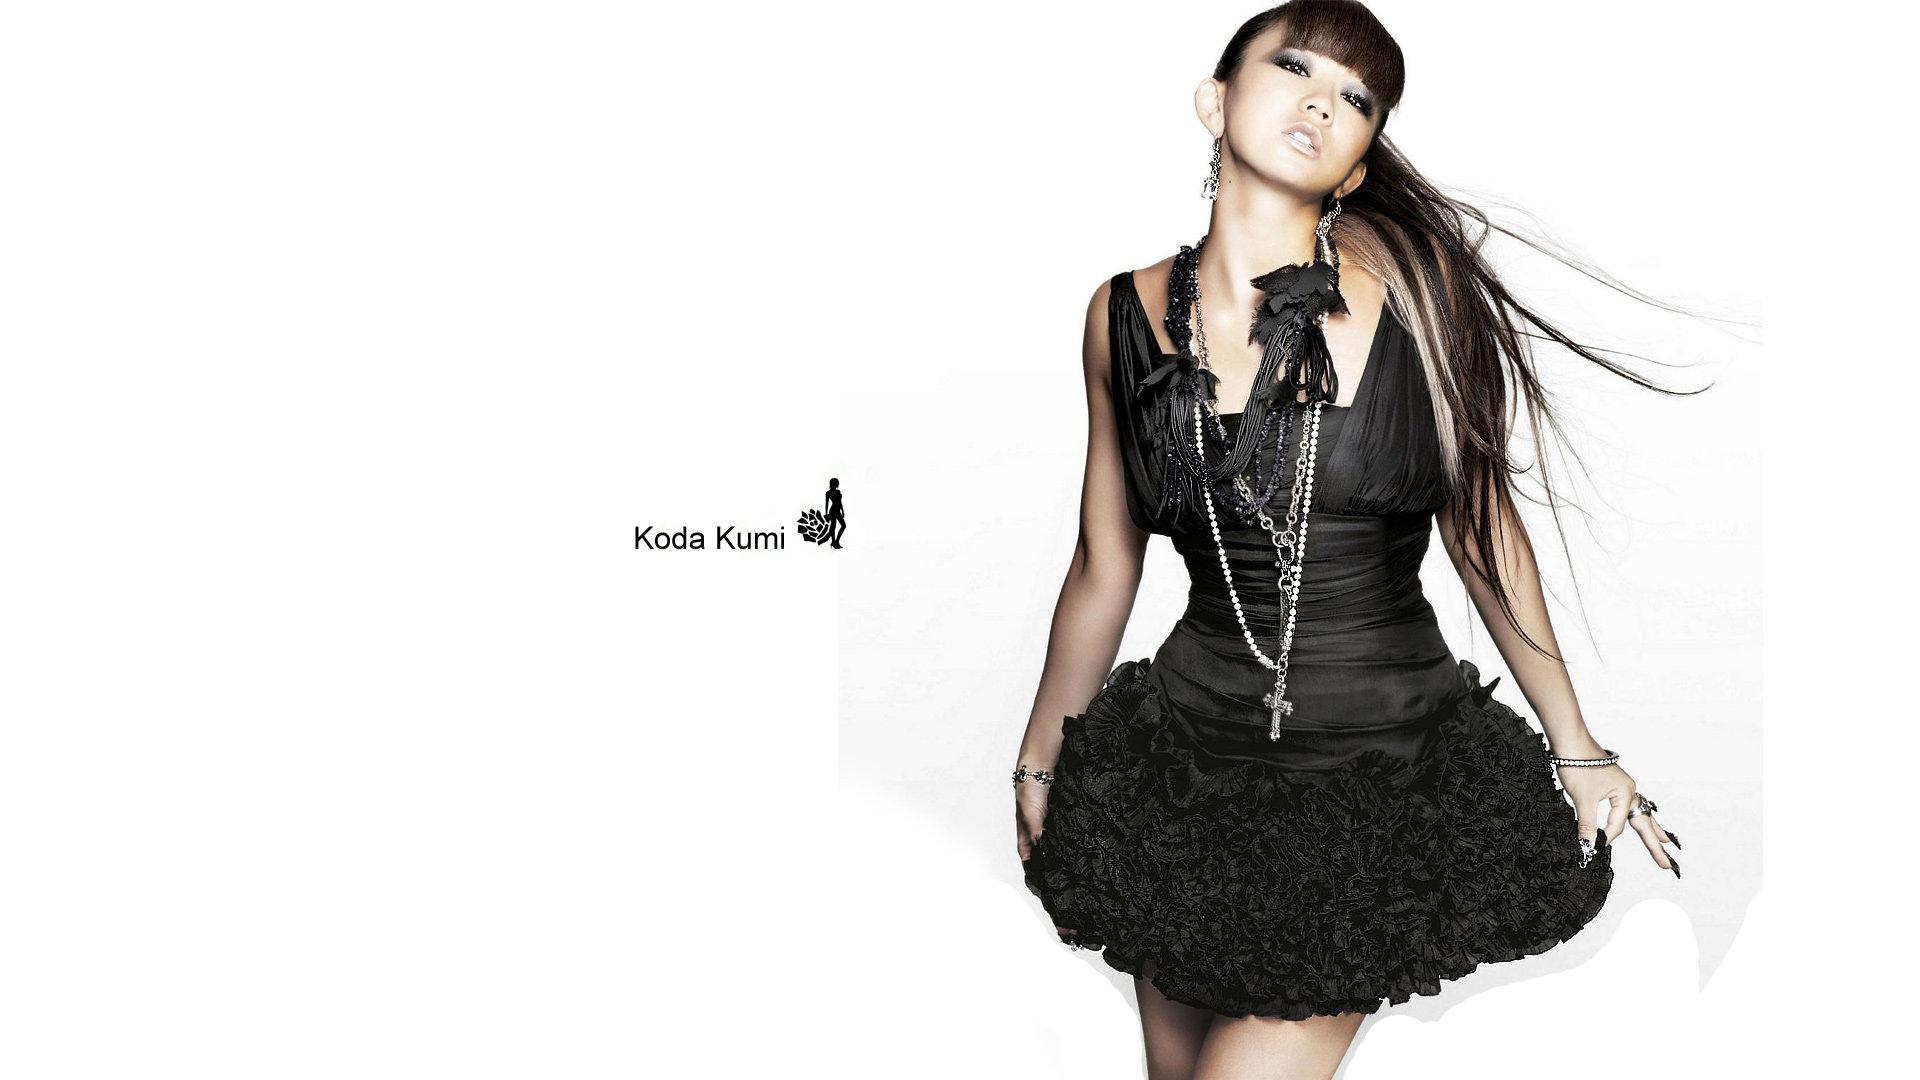 Nice Images Collection: Koda Kumi Desktop Wallpapers